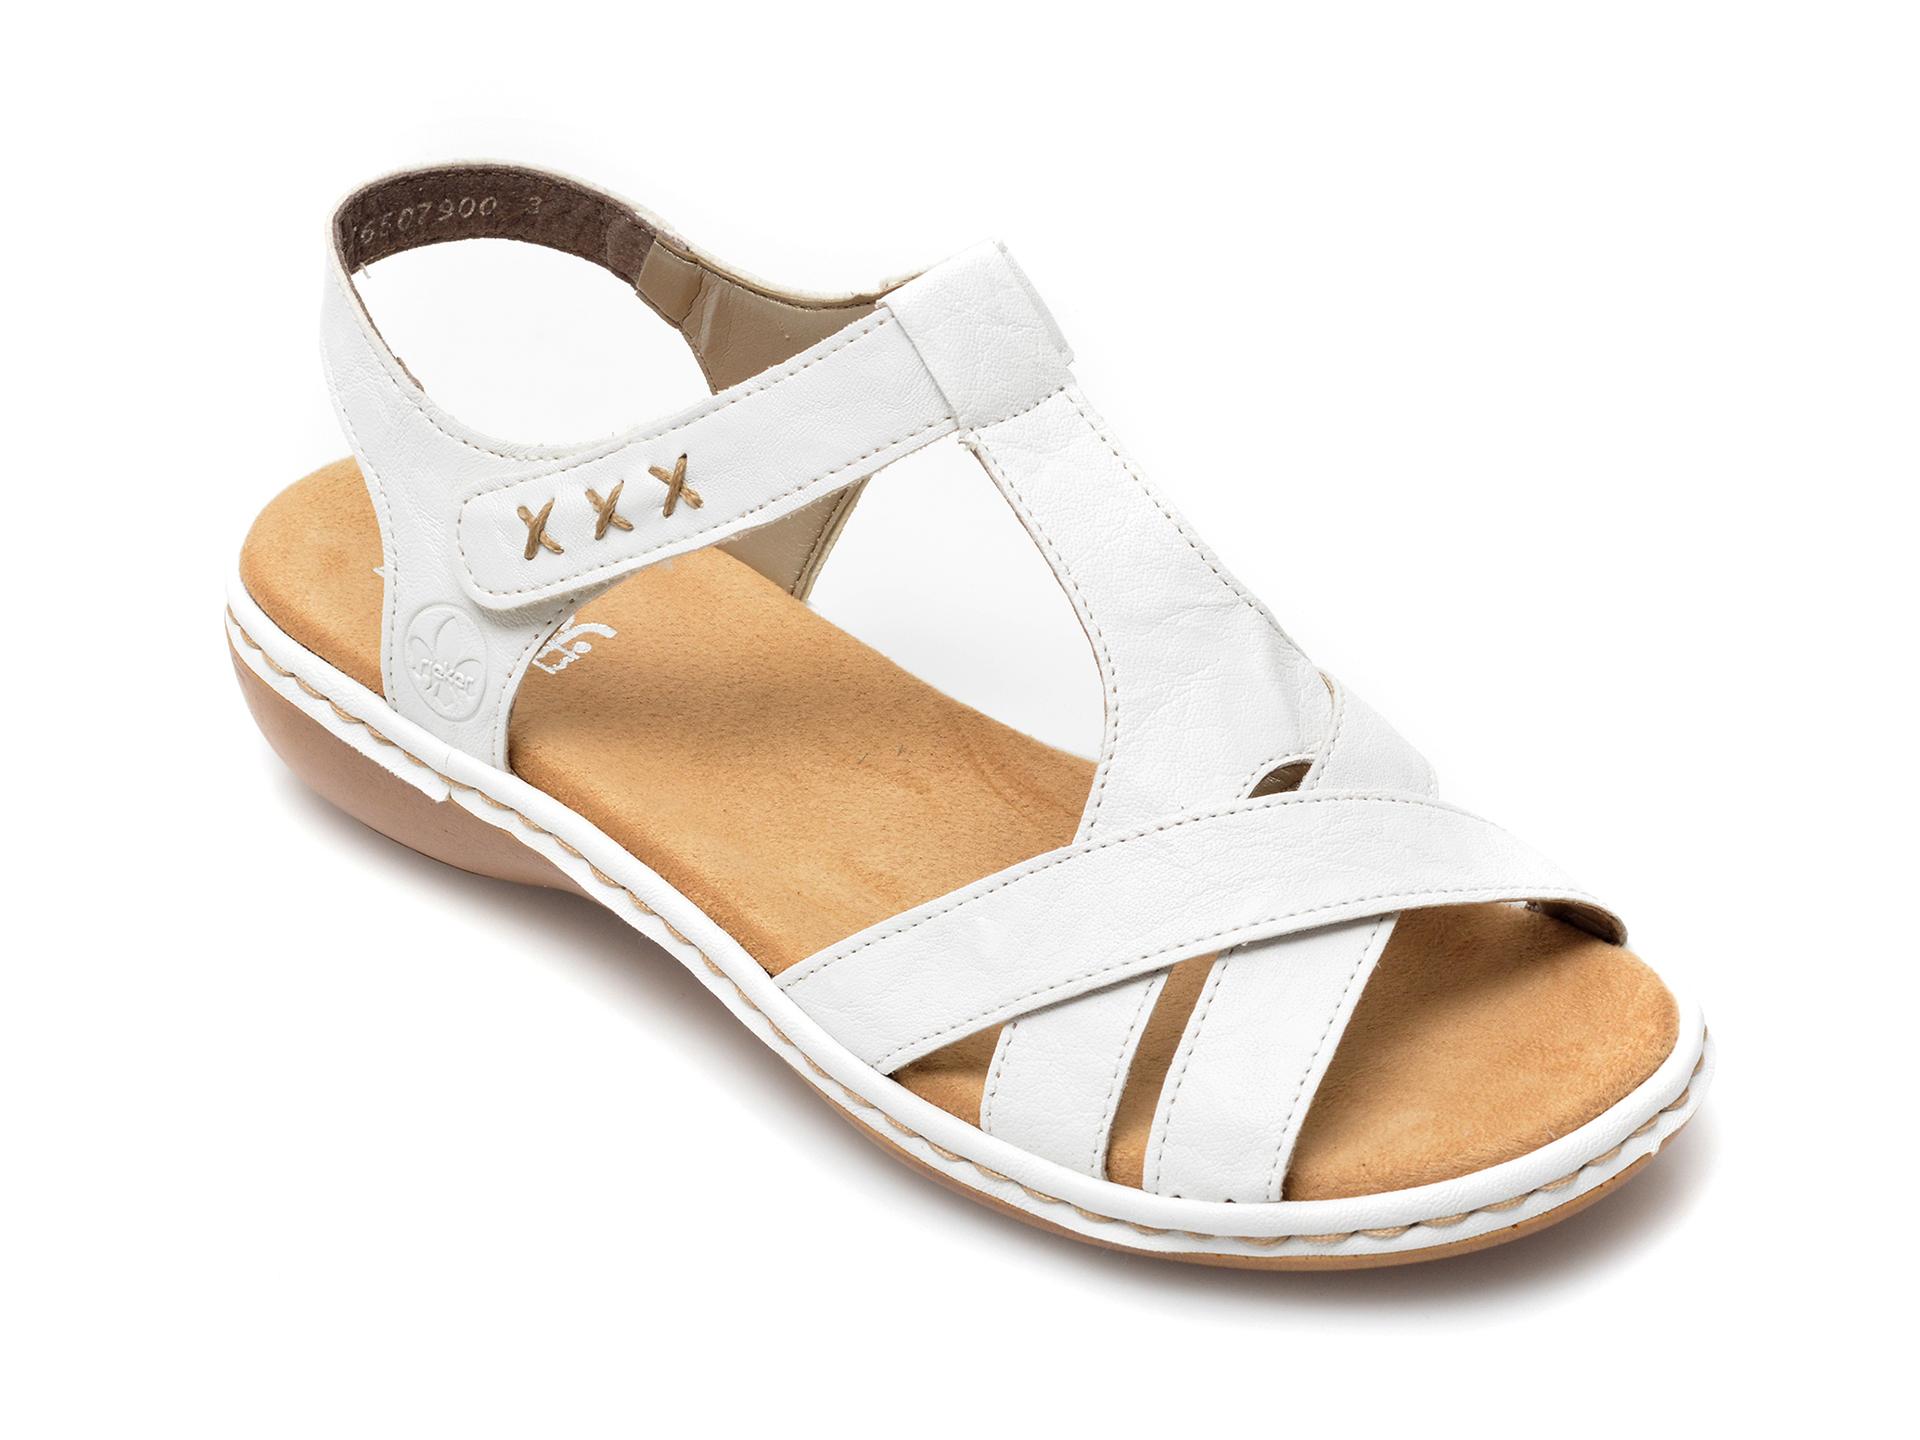 Sandale RIEKER albe, 69919, din piele naturala imagine otter.ro 2021